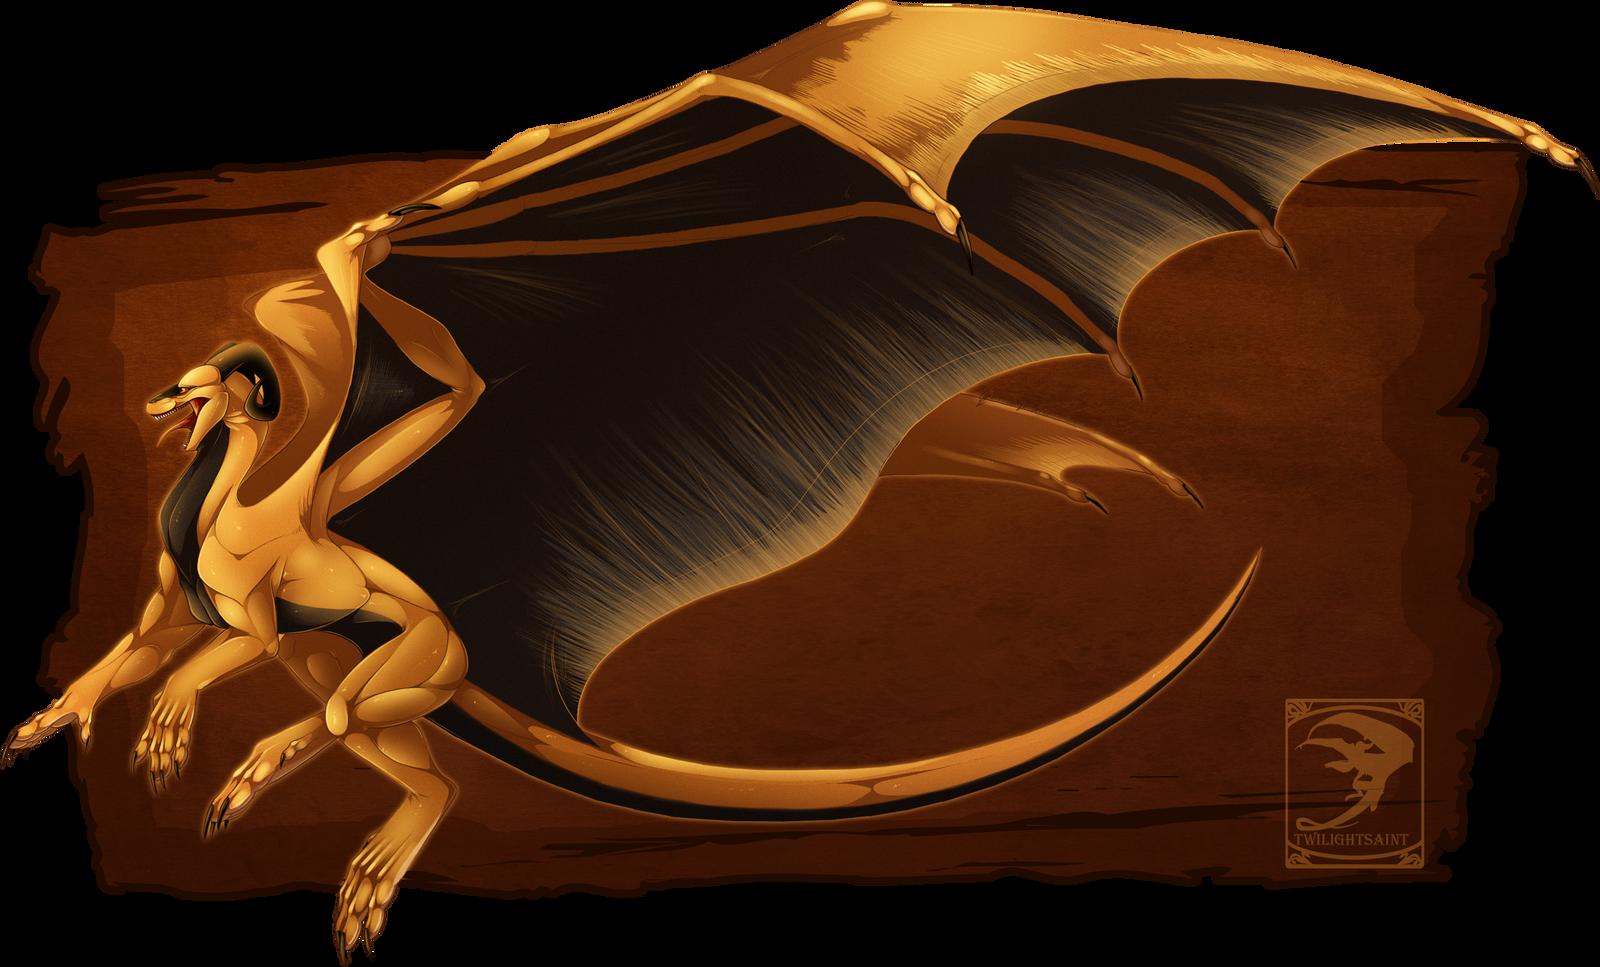 Comish - Golden Ferocity by TwilightSaint